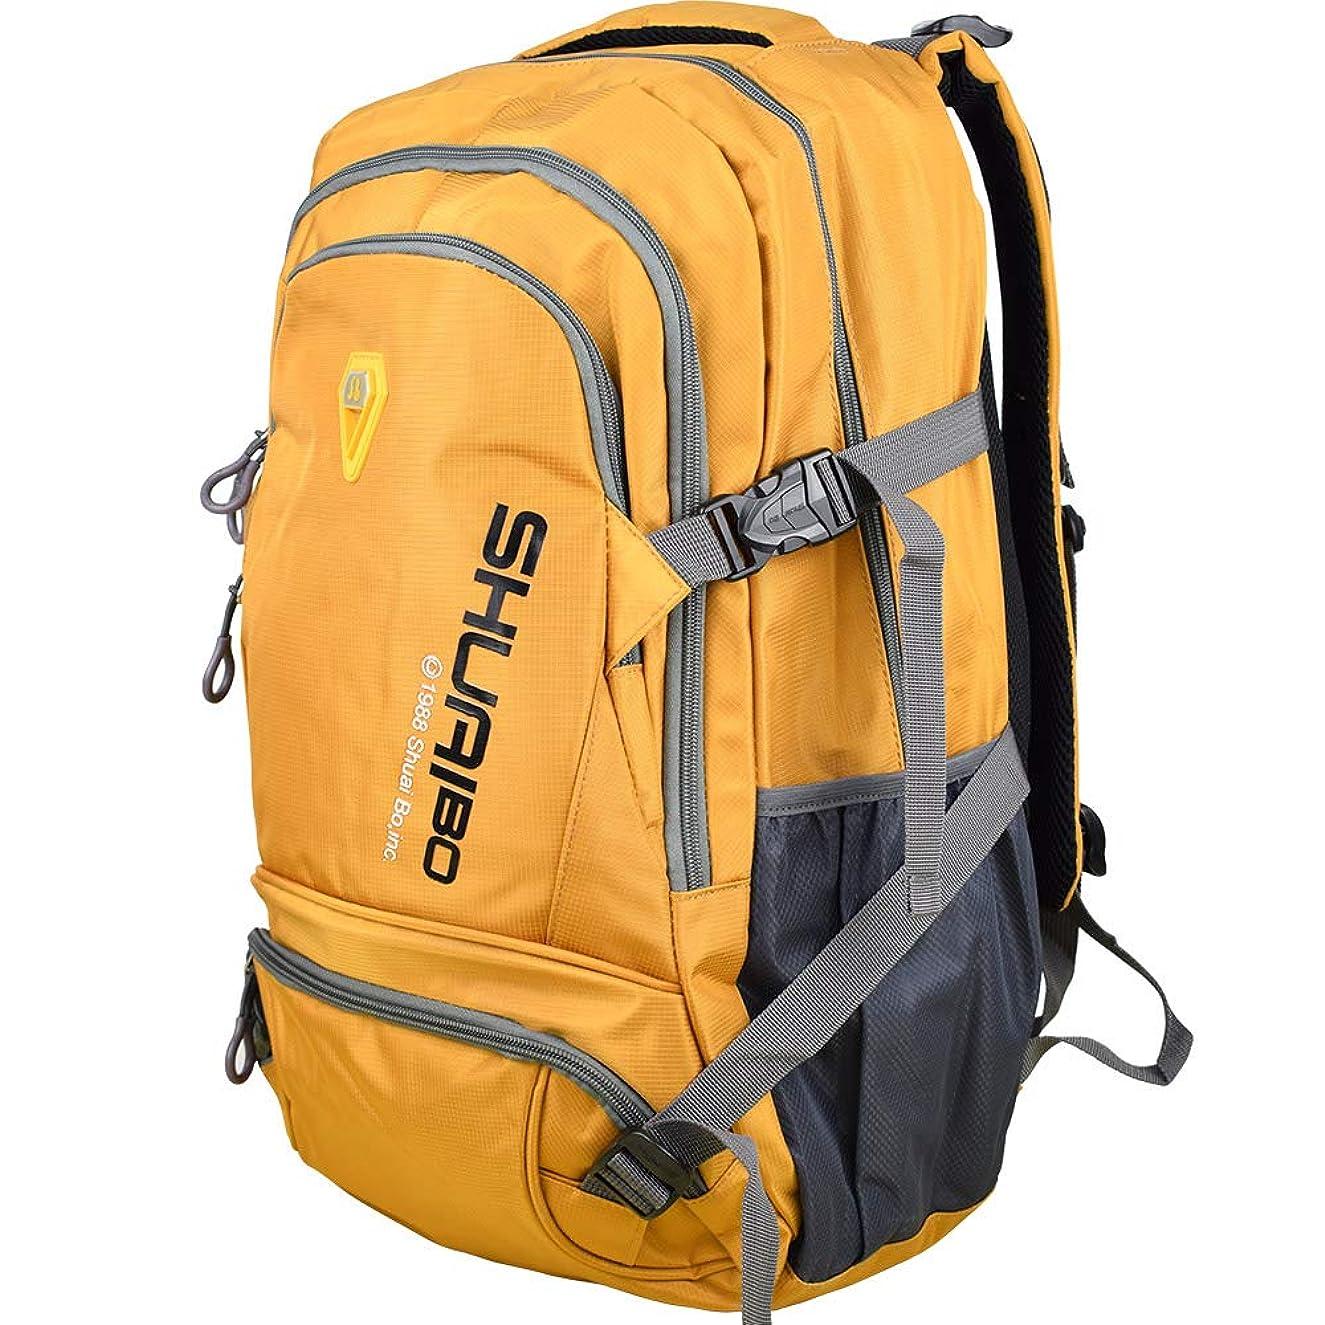 Large Laptop backpack 35L Lightweight Water Resistant Travel Hiking Daypack 15.6 Inch Macbook laptop bag (Orange)